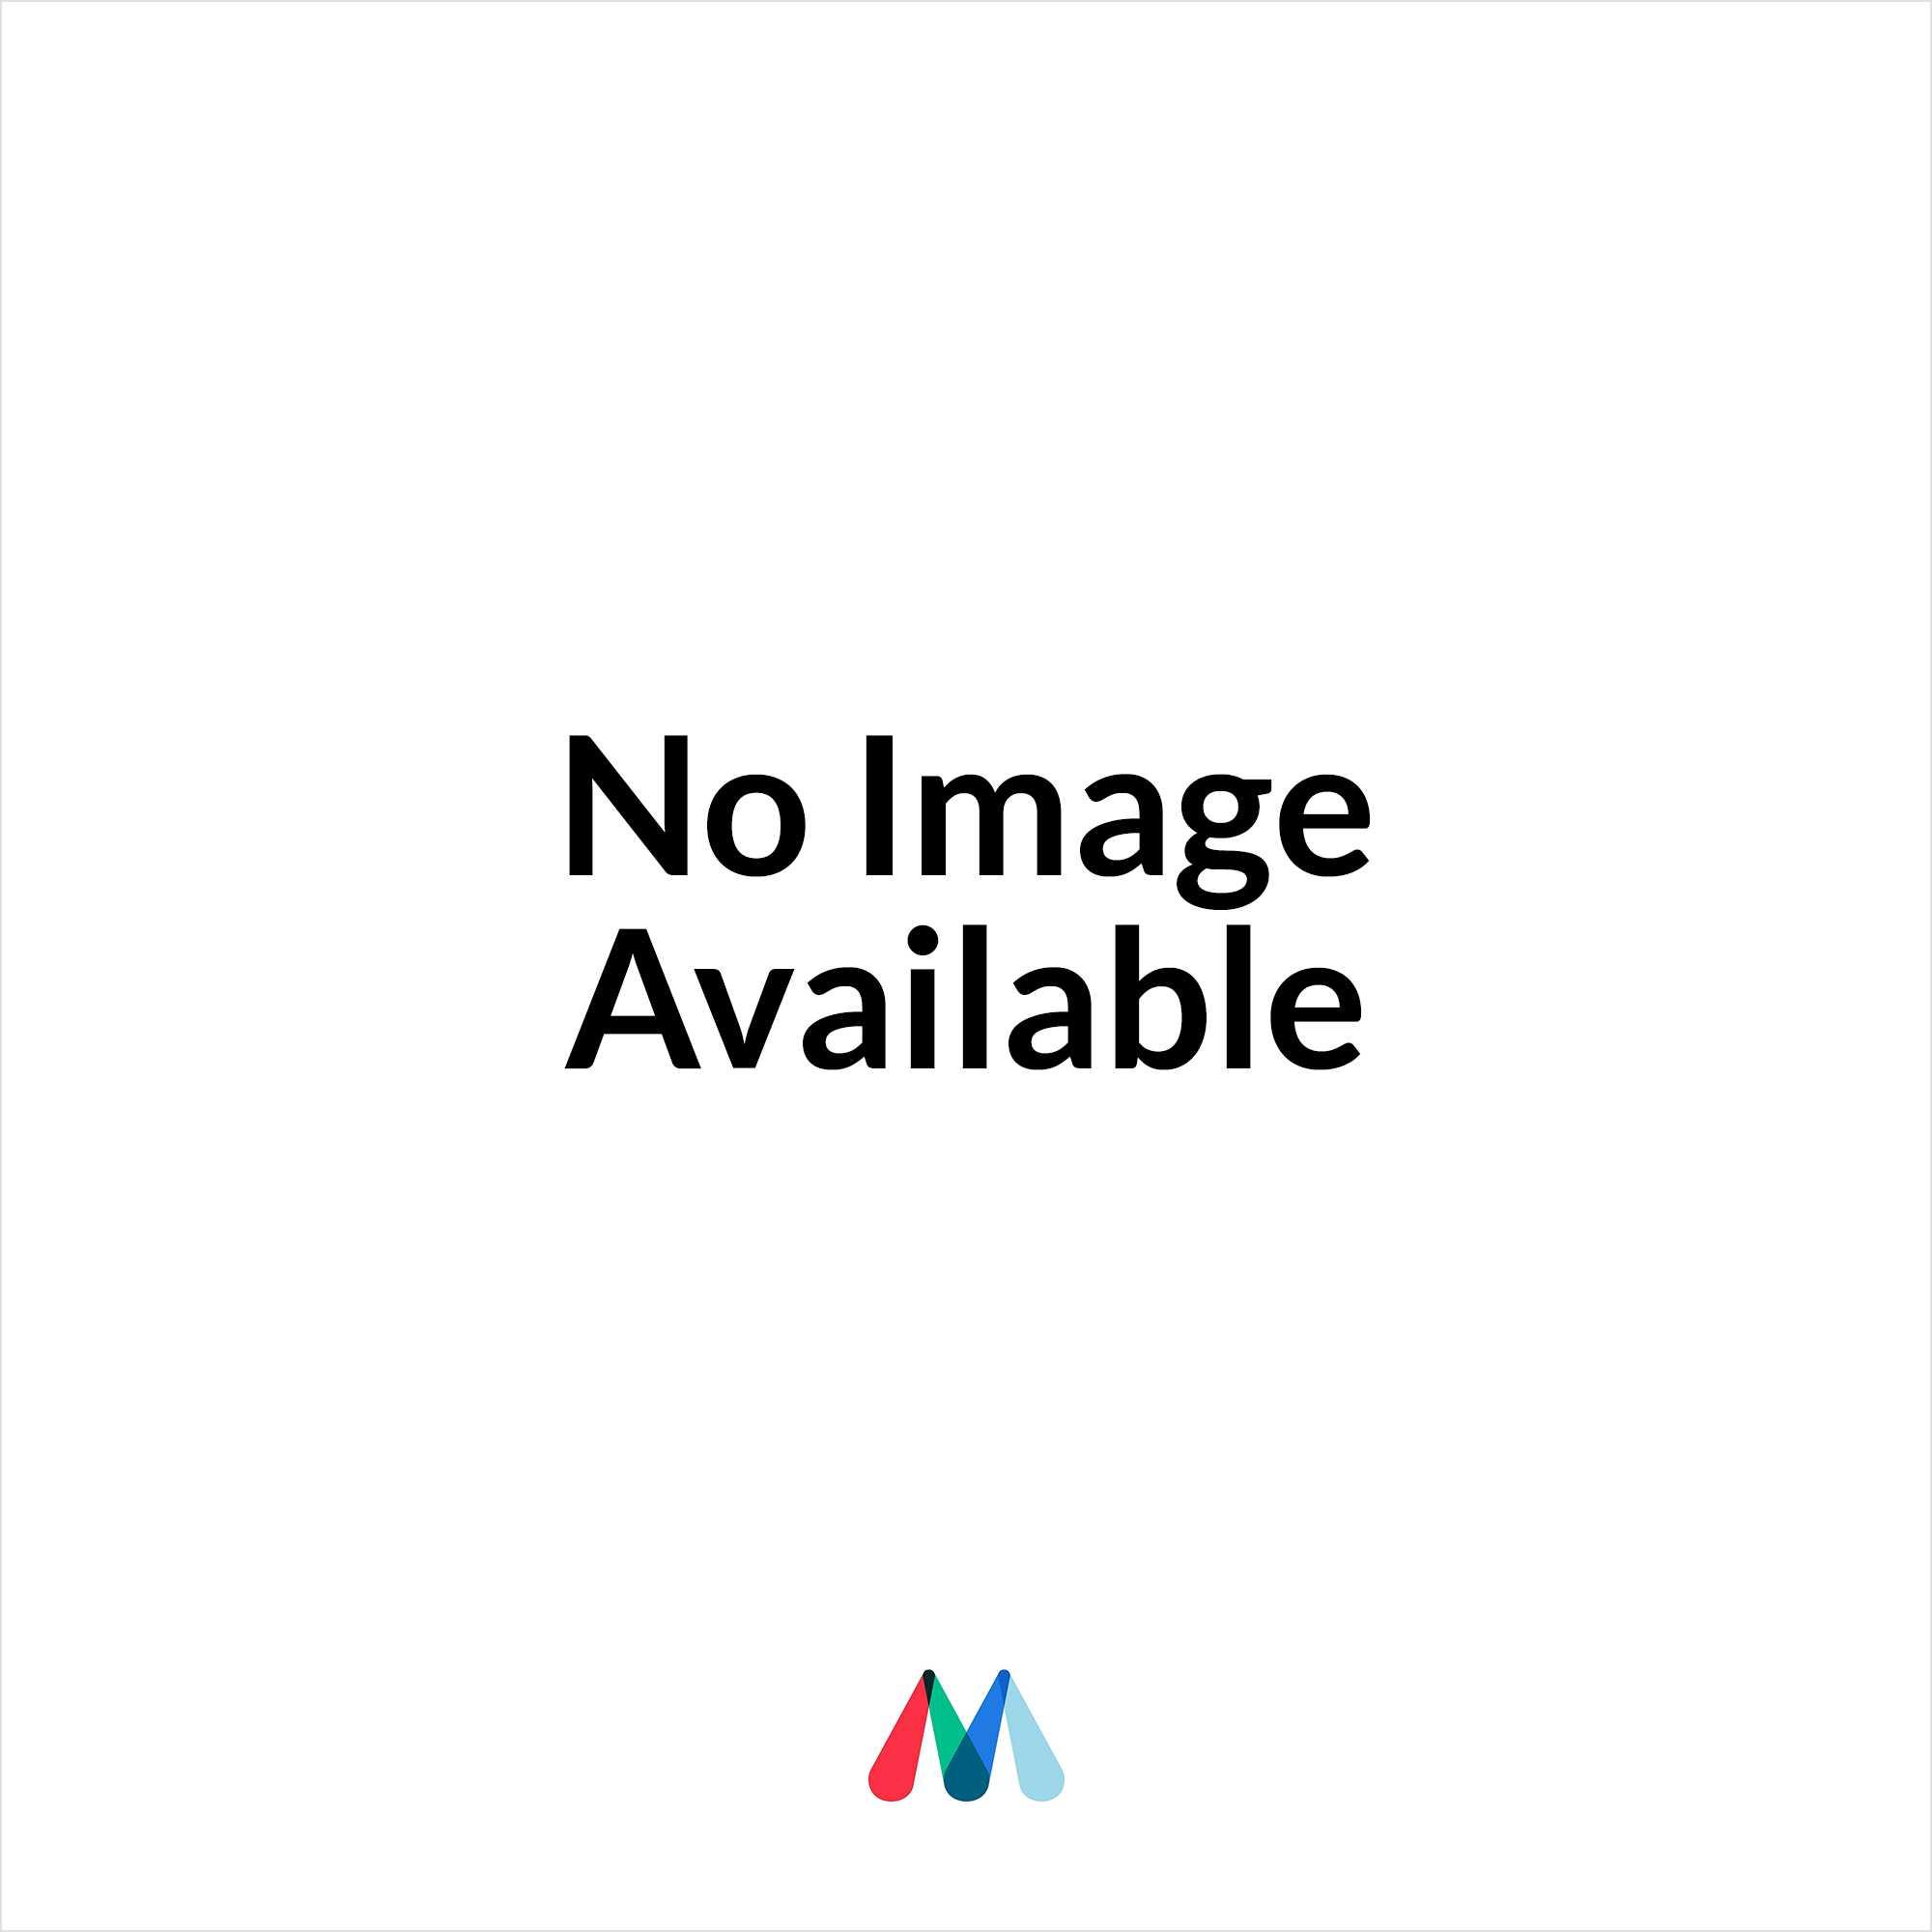 collingwood lighting ms02 ip adjustable led mini light stainless rh moonlightdesign co uk Simple LED Circuits LED Light Fixture Wiring Diagram